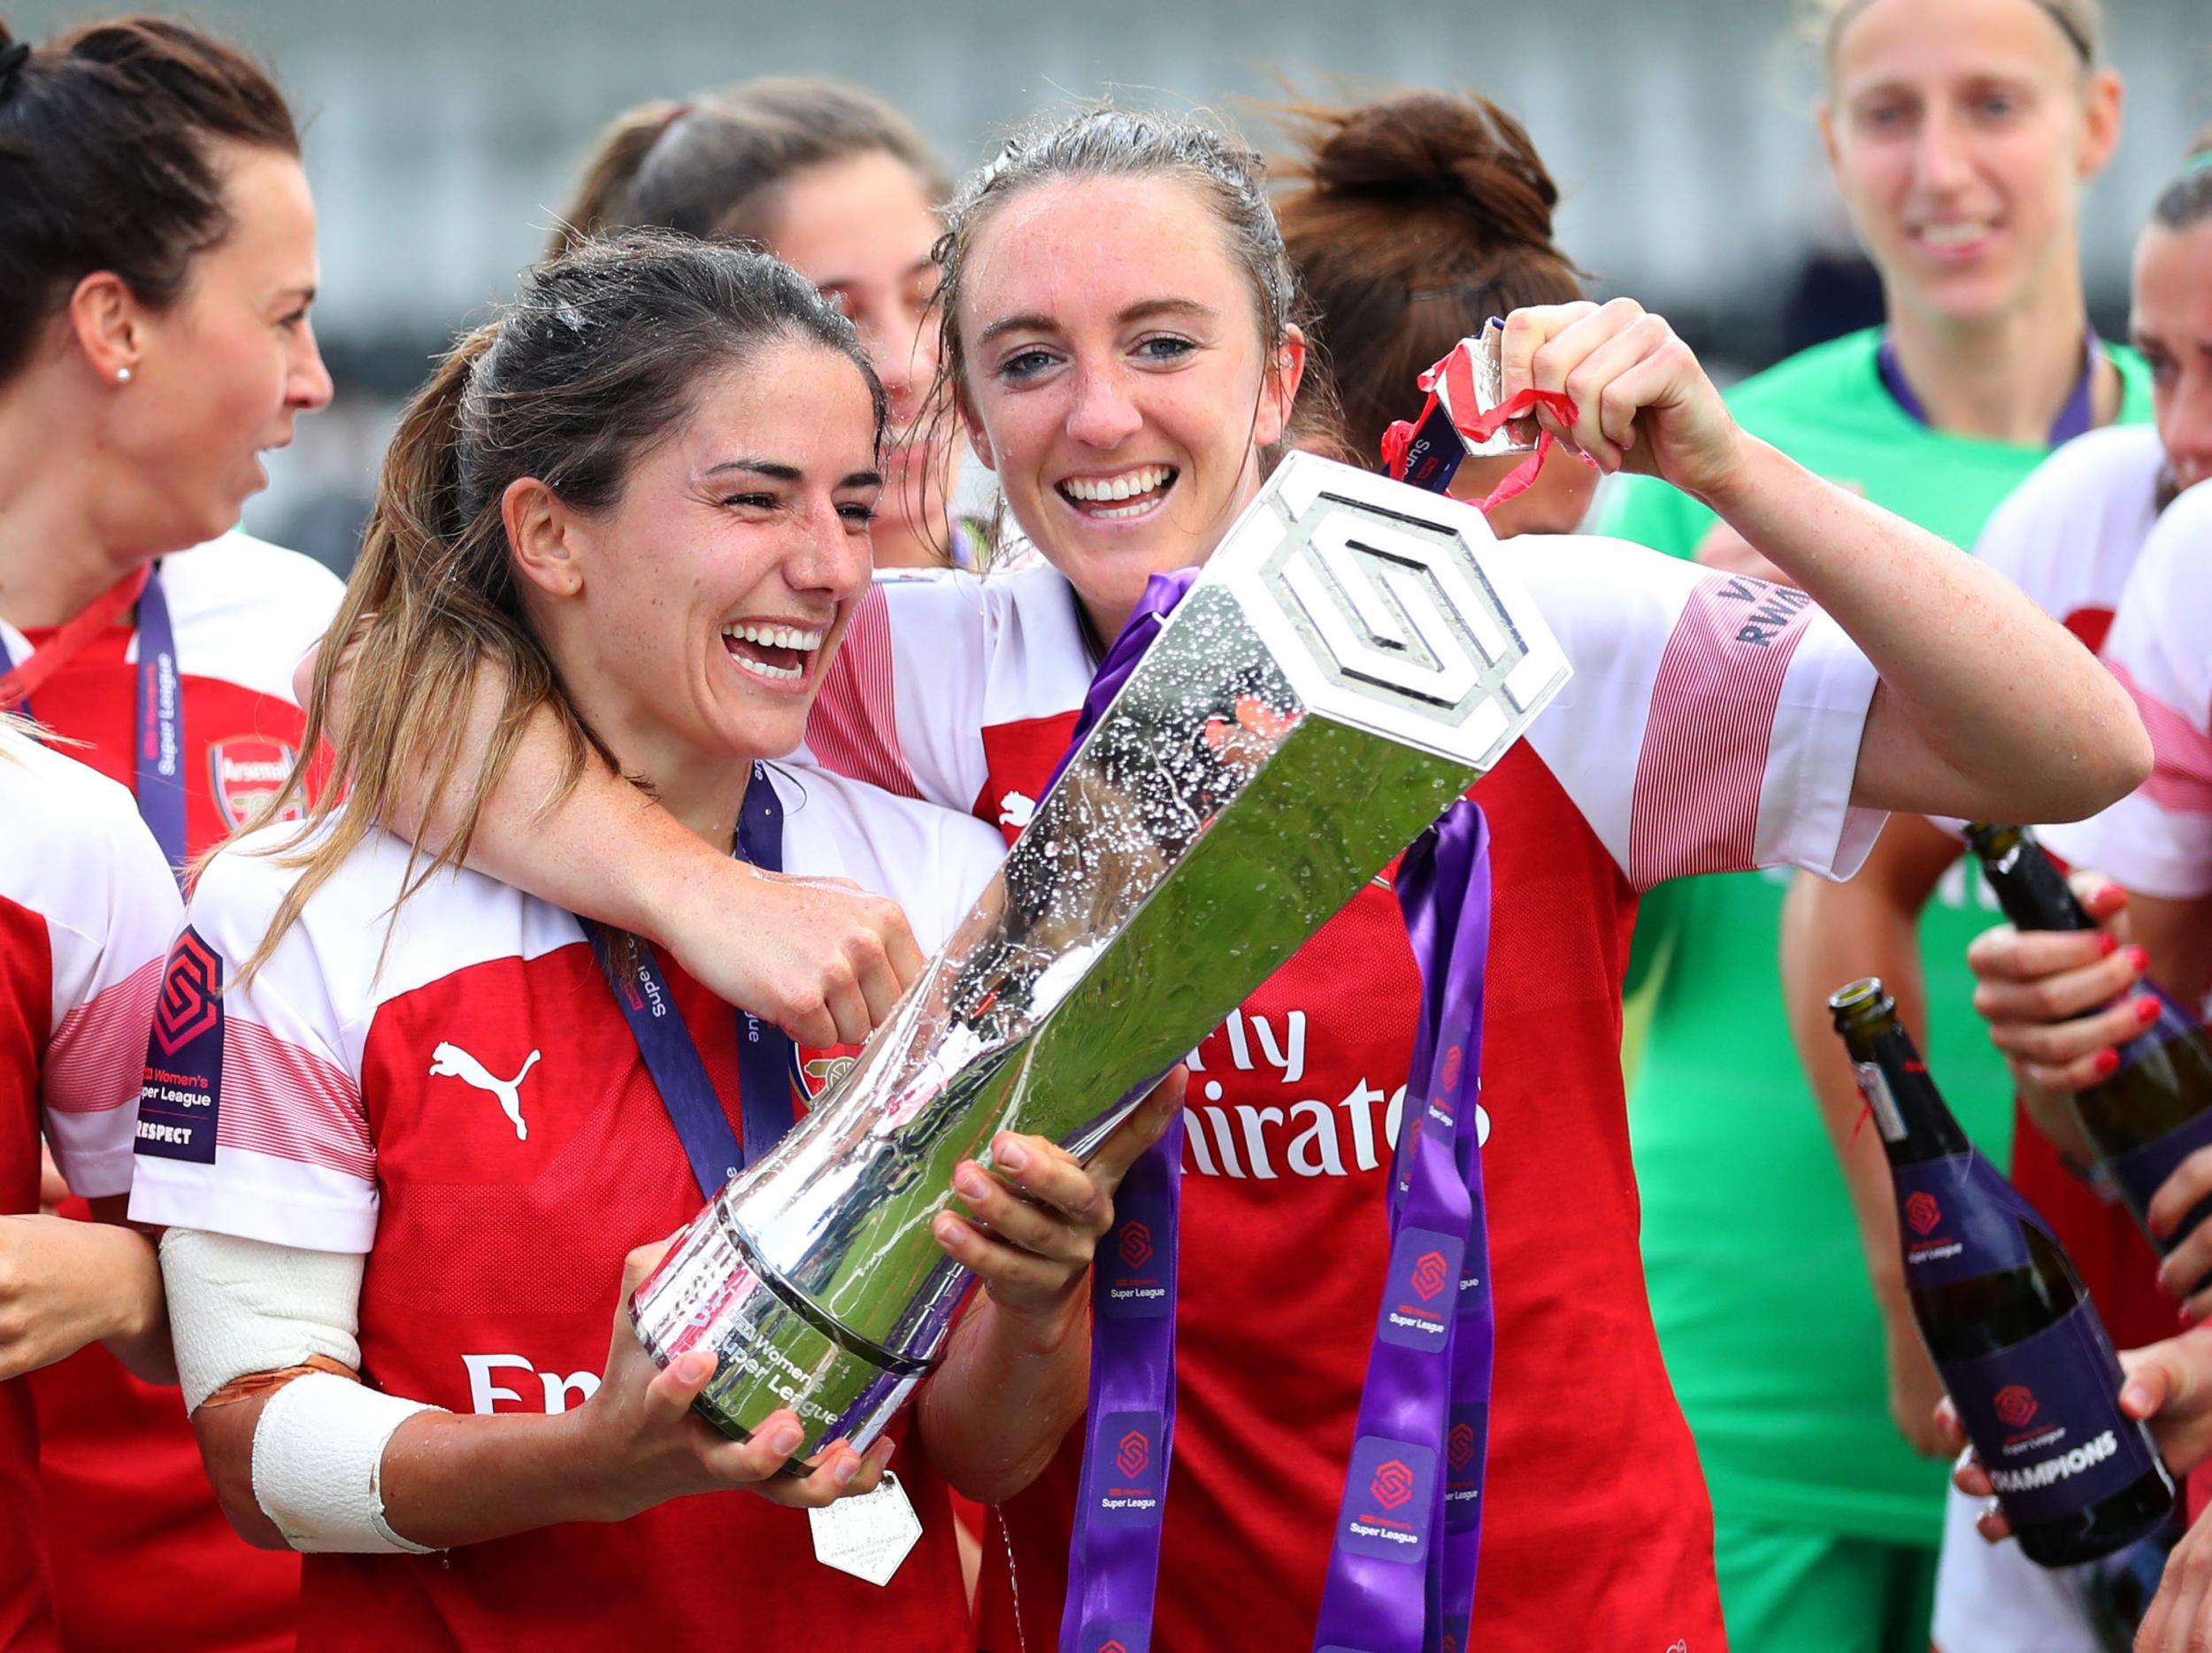 Women's Super League set for weekend of bumper attendances thanks to FA initiative